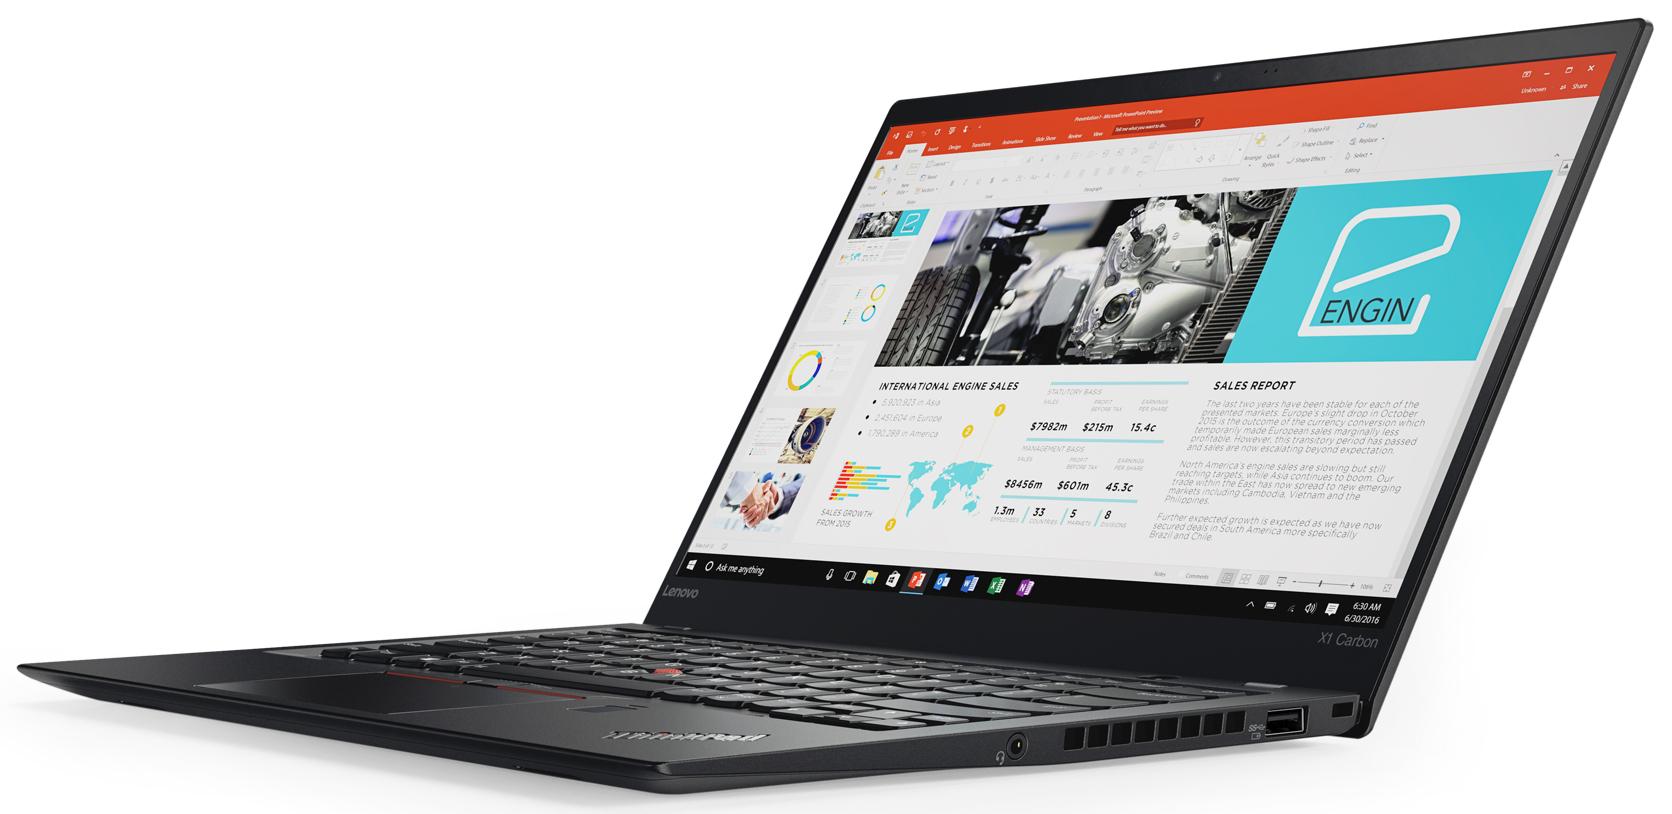 [notebooksandmore] Lenovo ThinkPad X1 Carbon 5. Gen. i7-7500U, 16GB RAM, 1 TB PCIe NVMe SSD